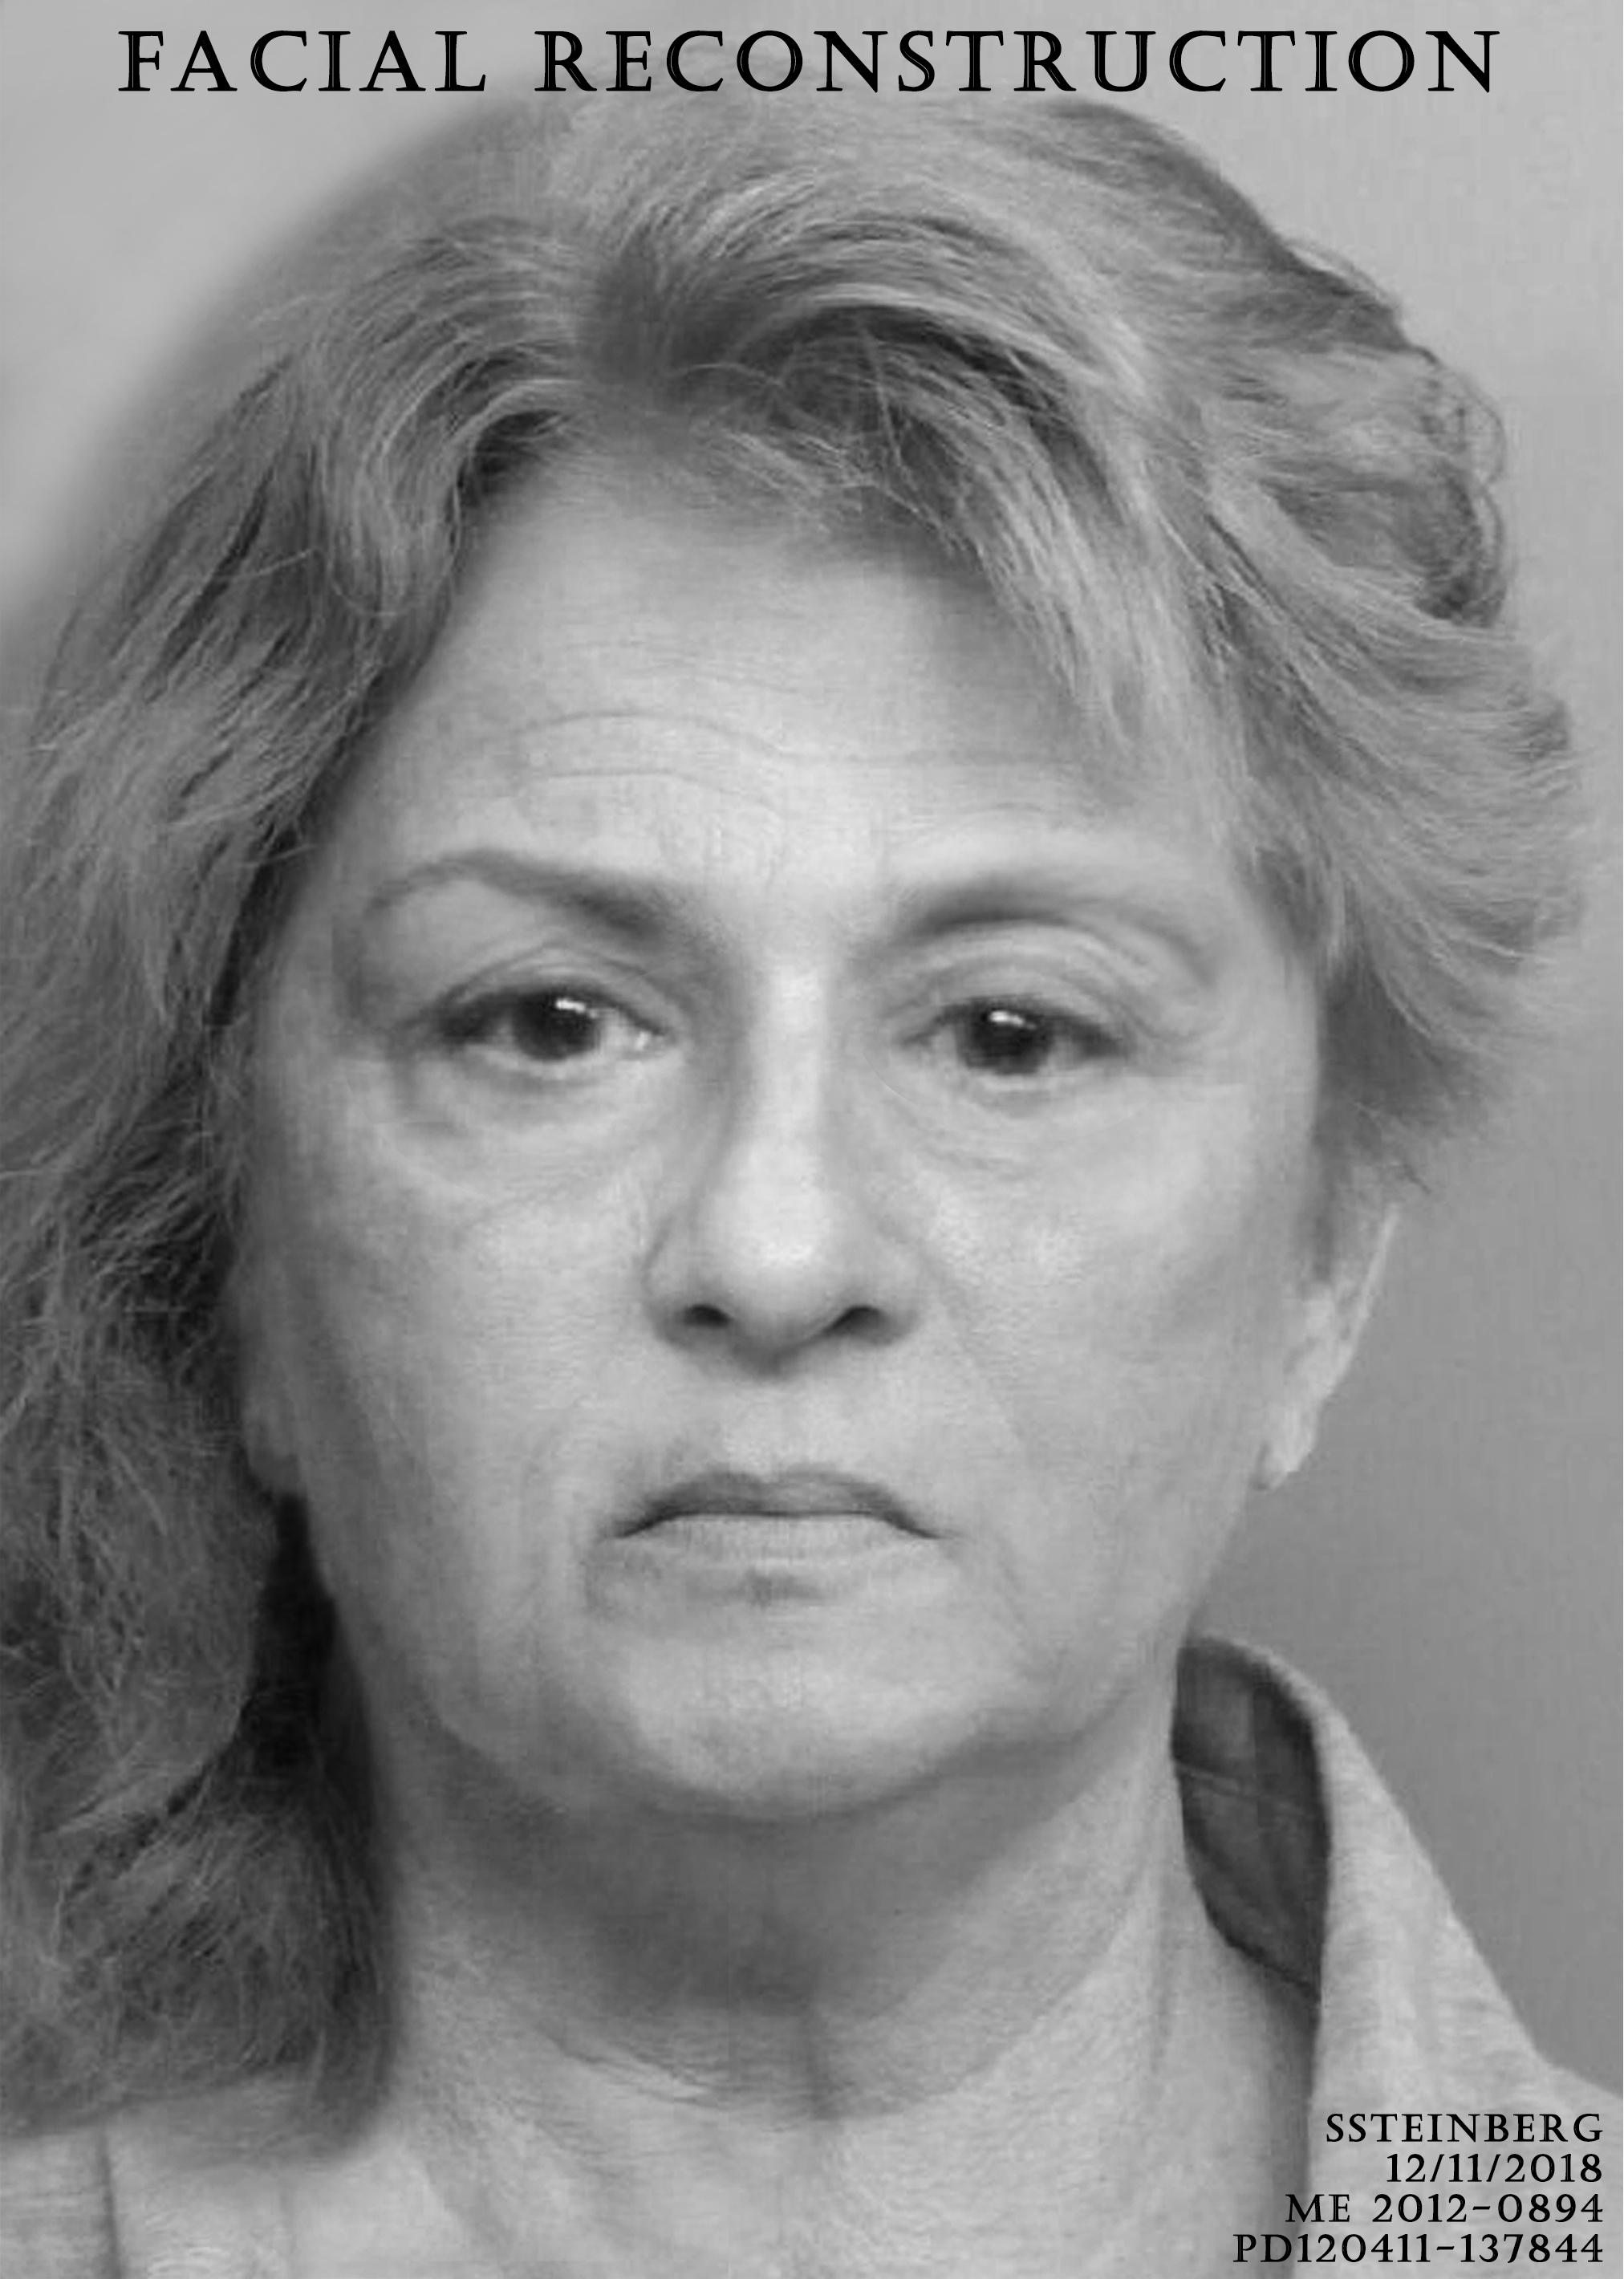 Miami-Dade County Jane Doe (2012)